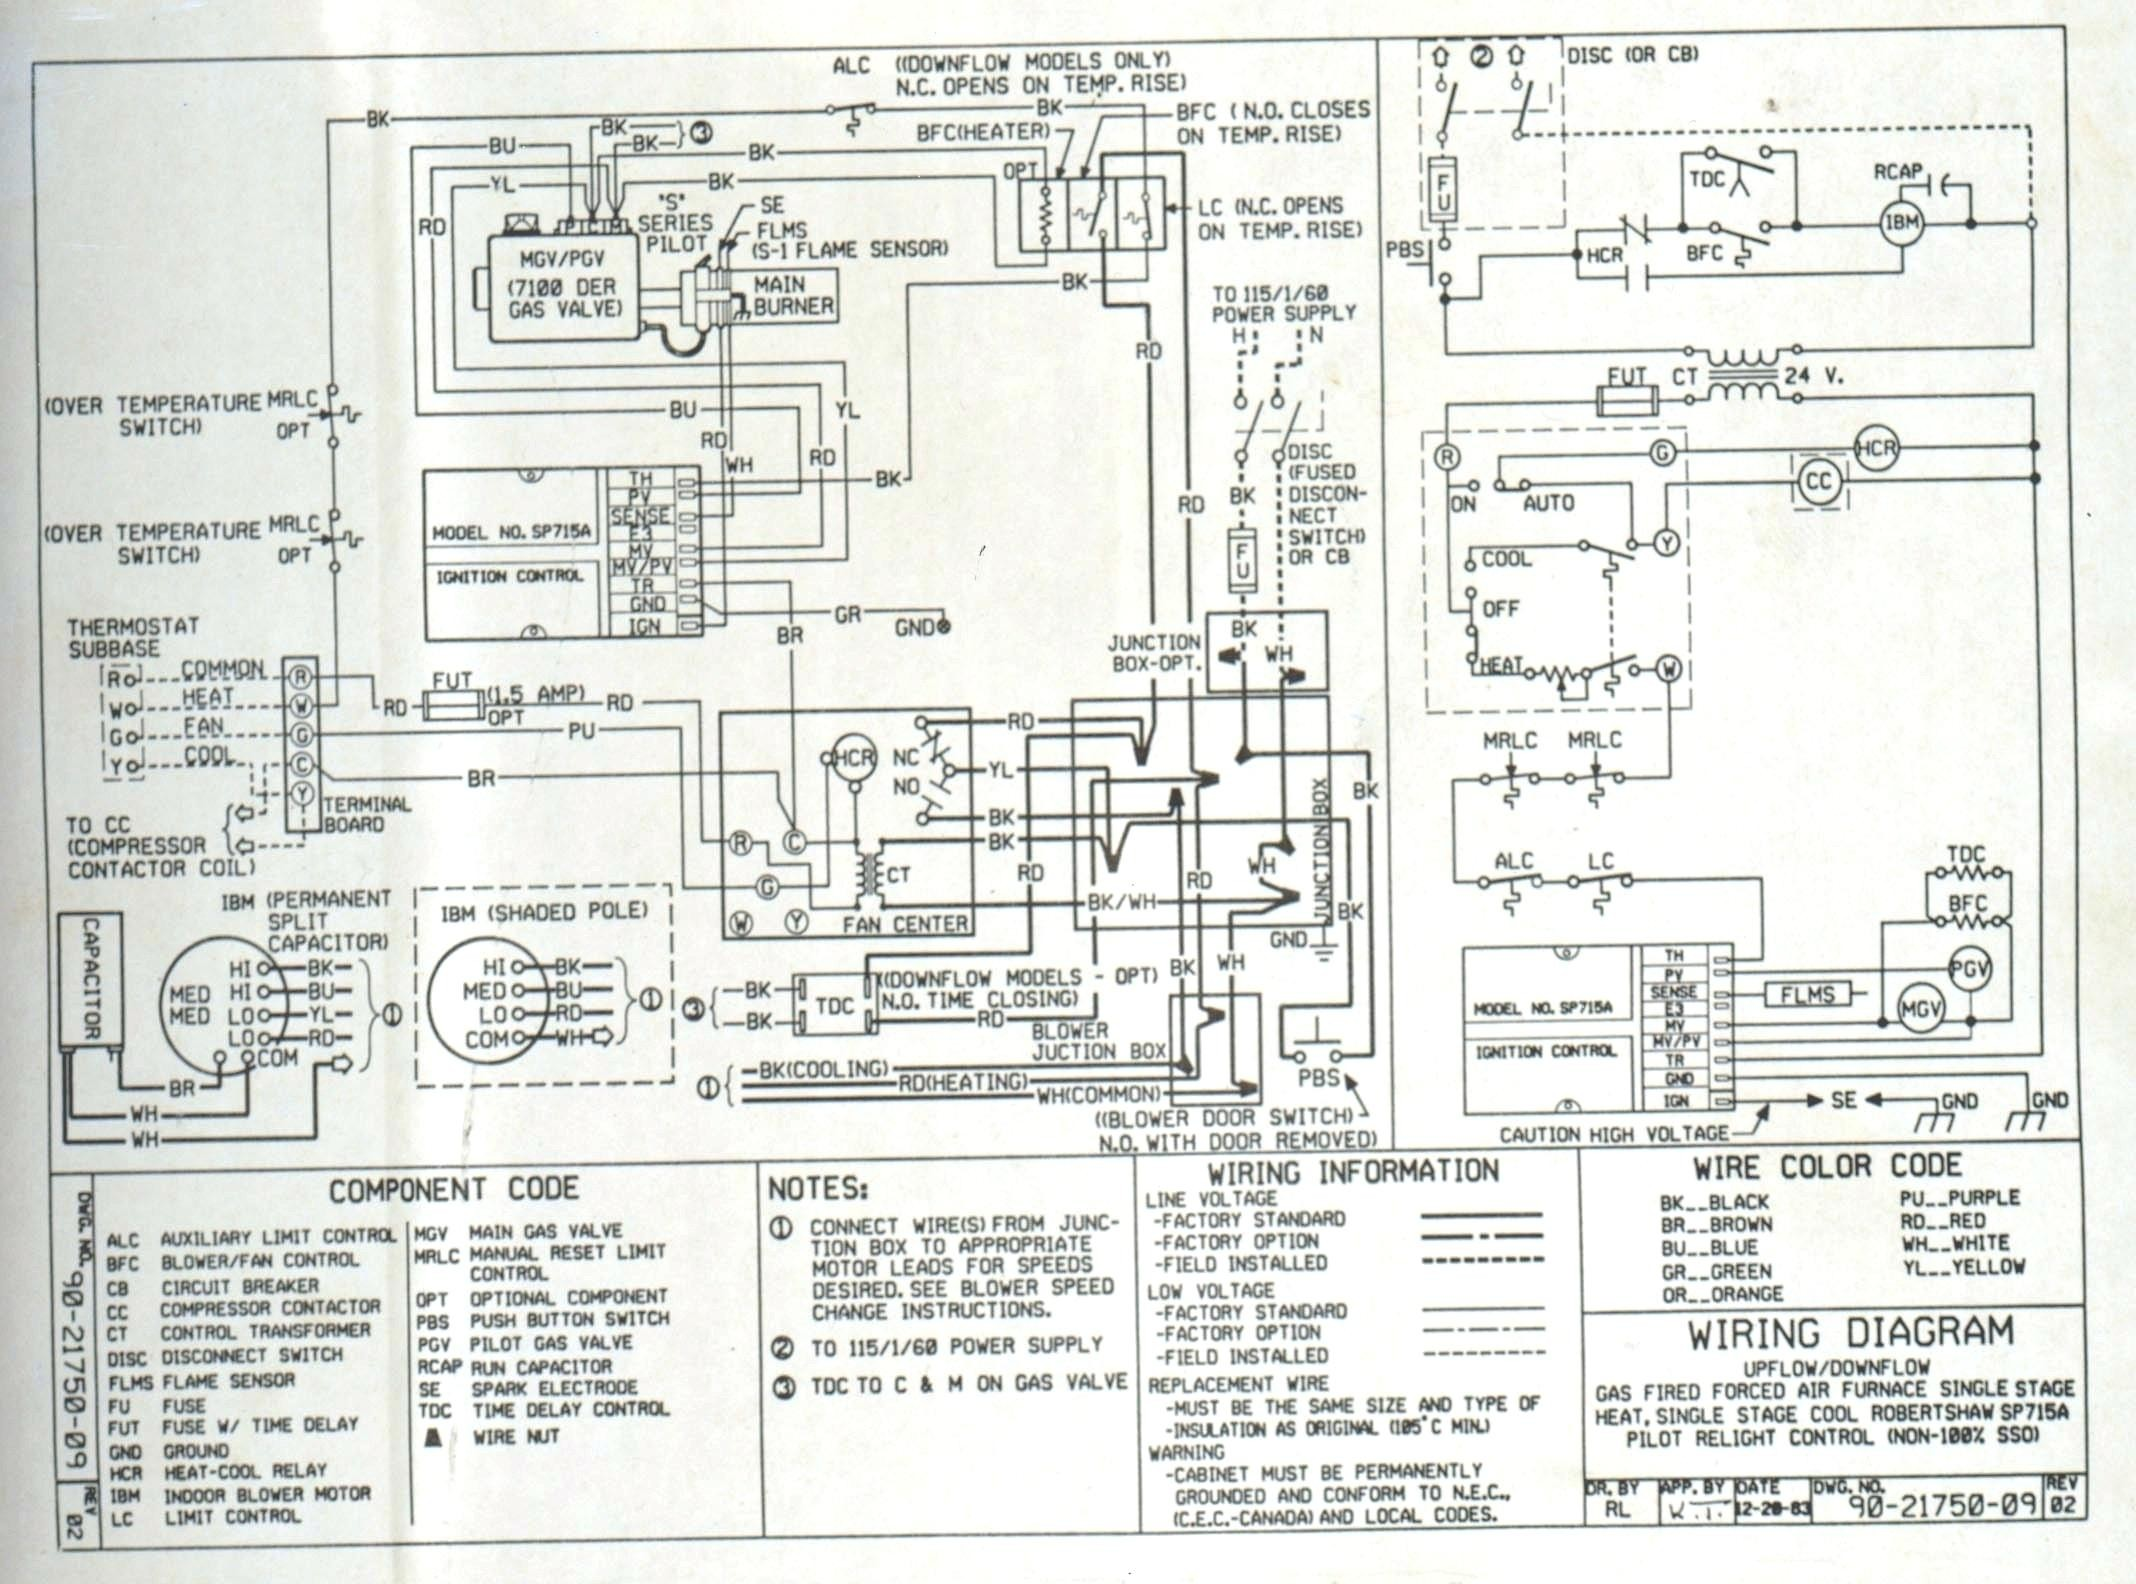 Ks 5264 Honeywell Gas Valve Wiring Diagram Free Diagram